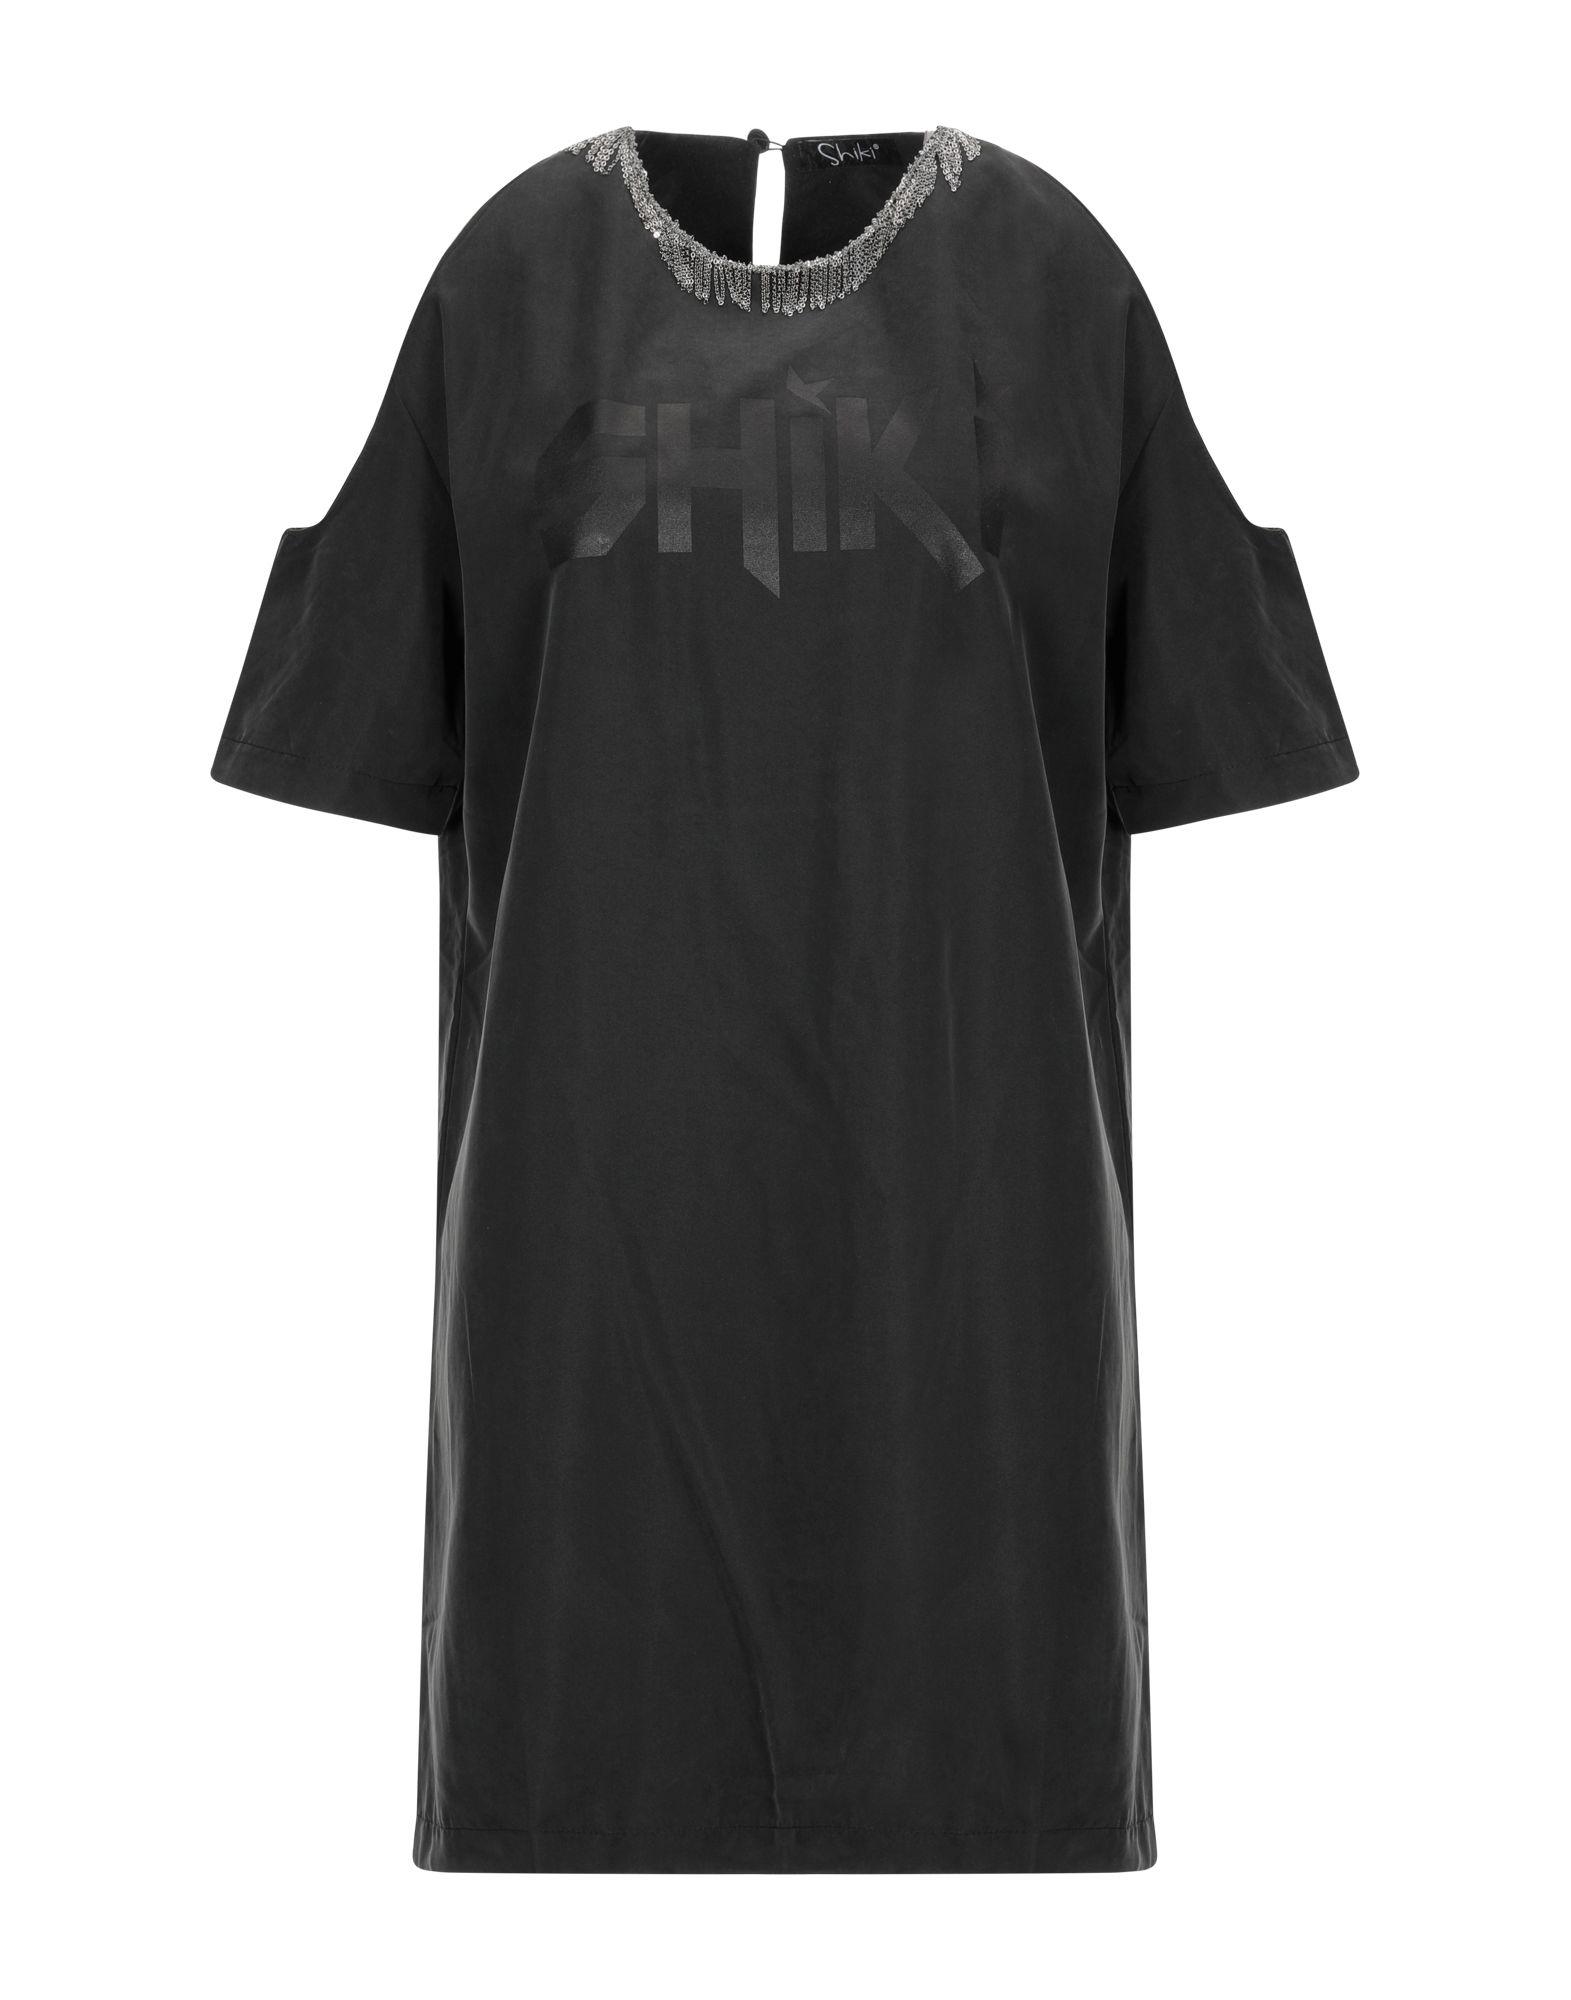 SHIKI Damen Kurzes Kleid Farbe Schwarz Größe 6